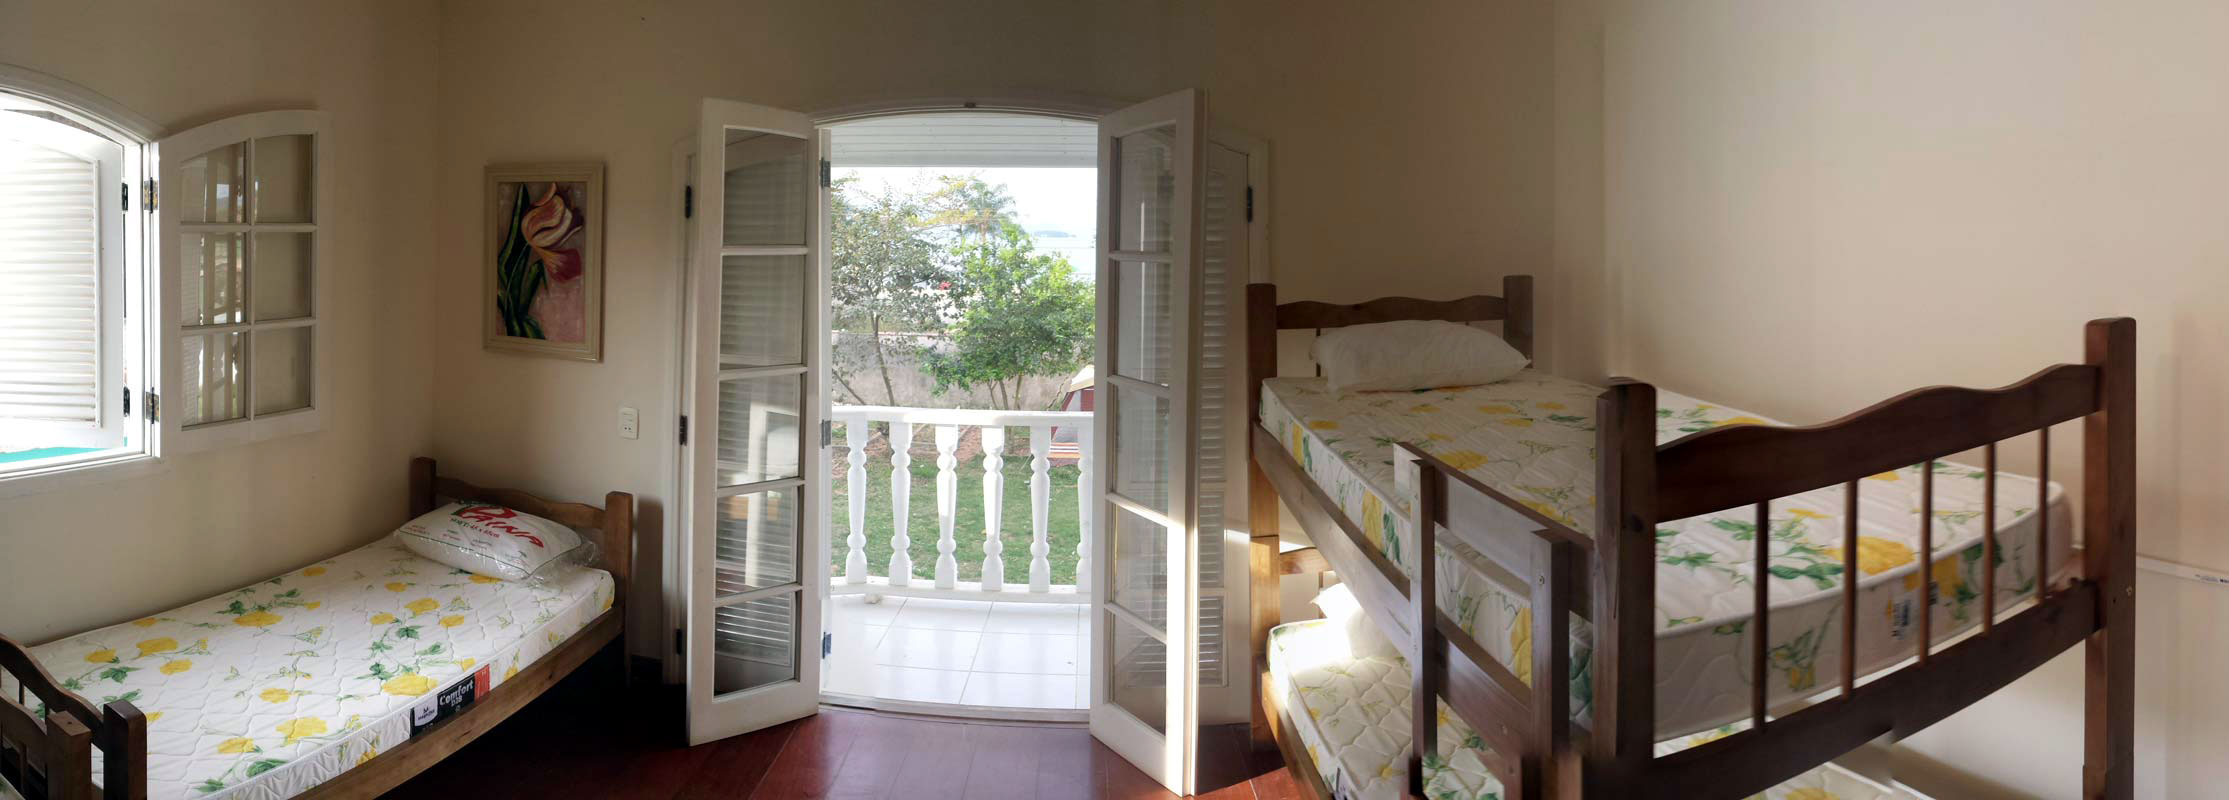 canguru-hostel-paraty-700